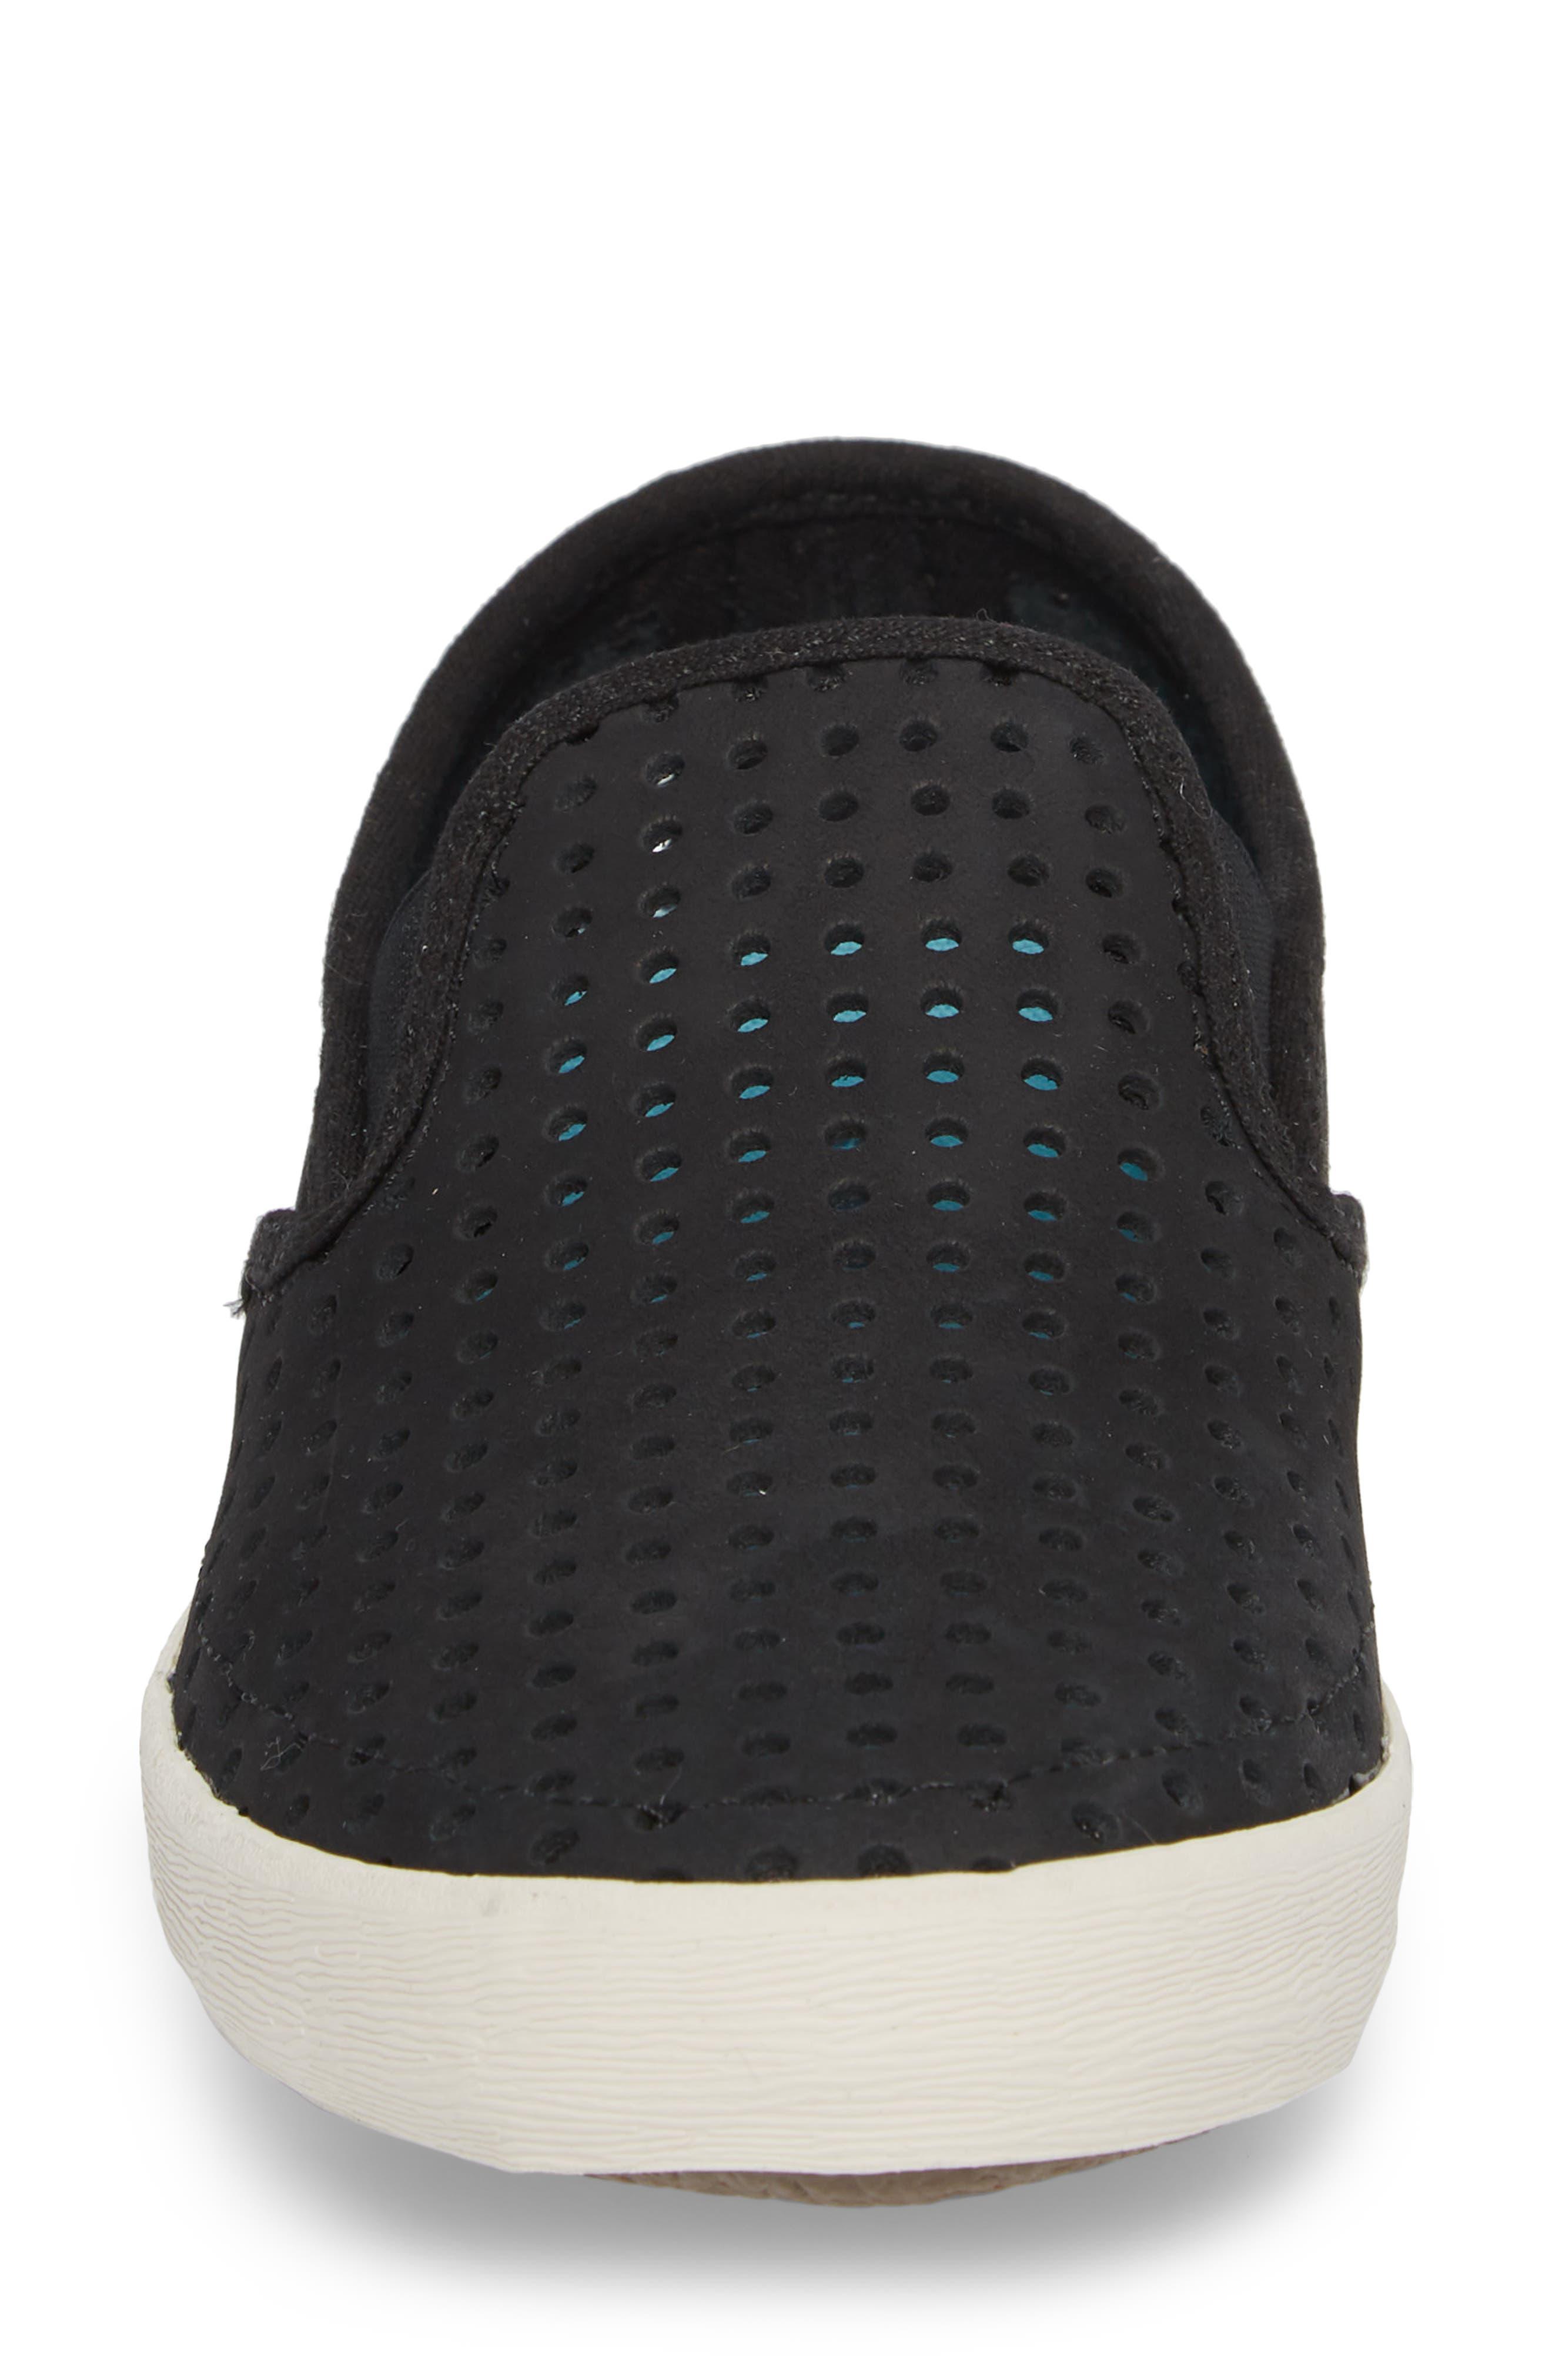 Baja Perforated Slip-On Sneaker,                             Alternate thumbnail 4, color,                             BLACK